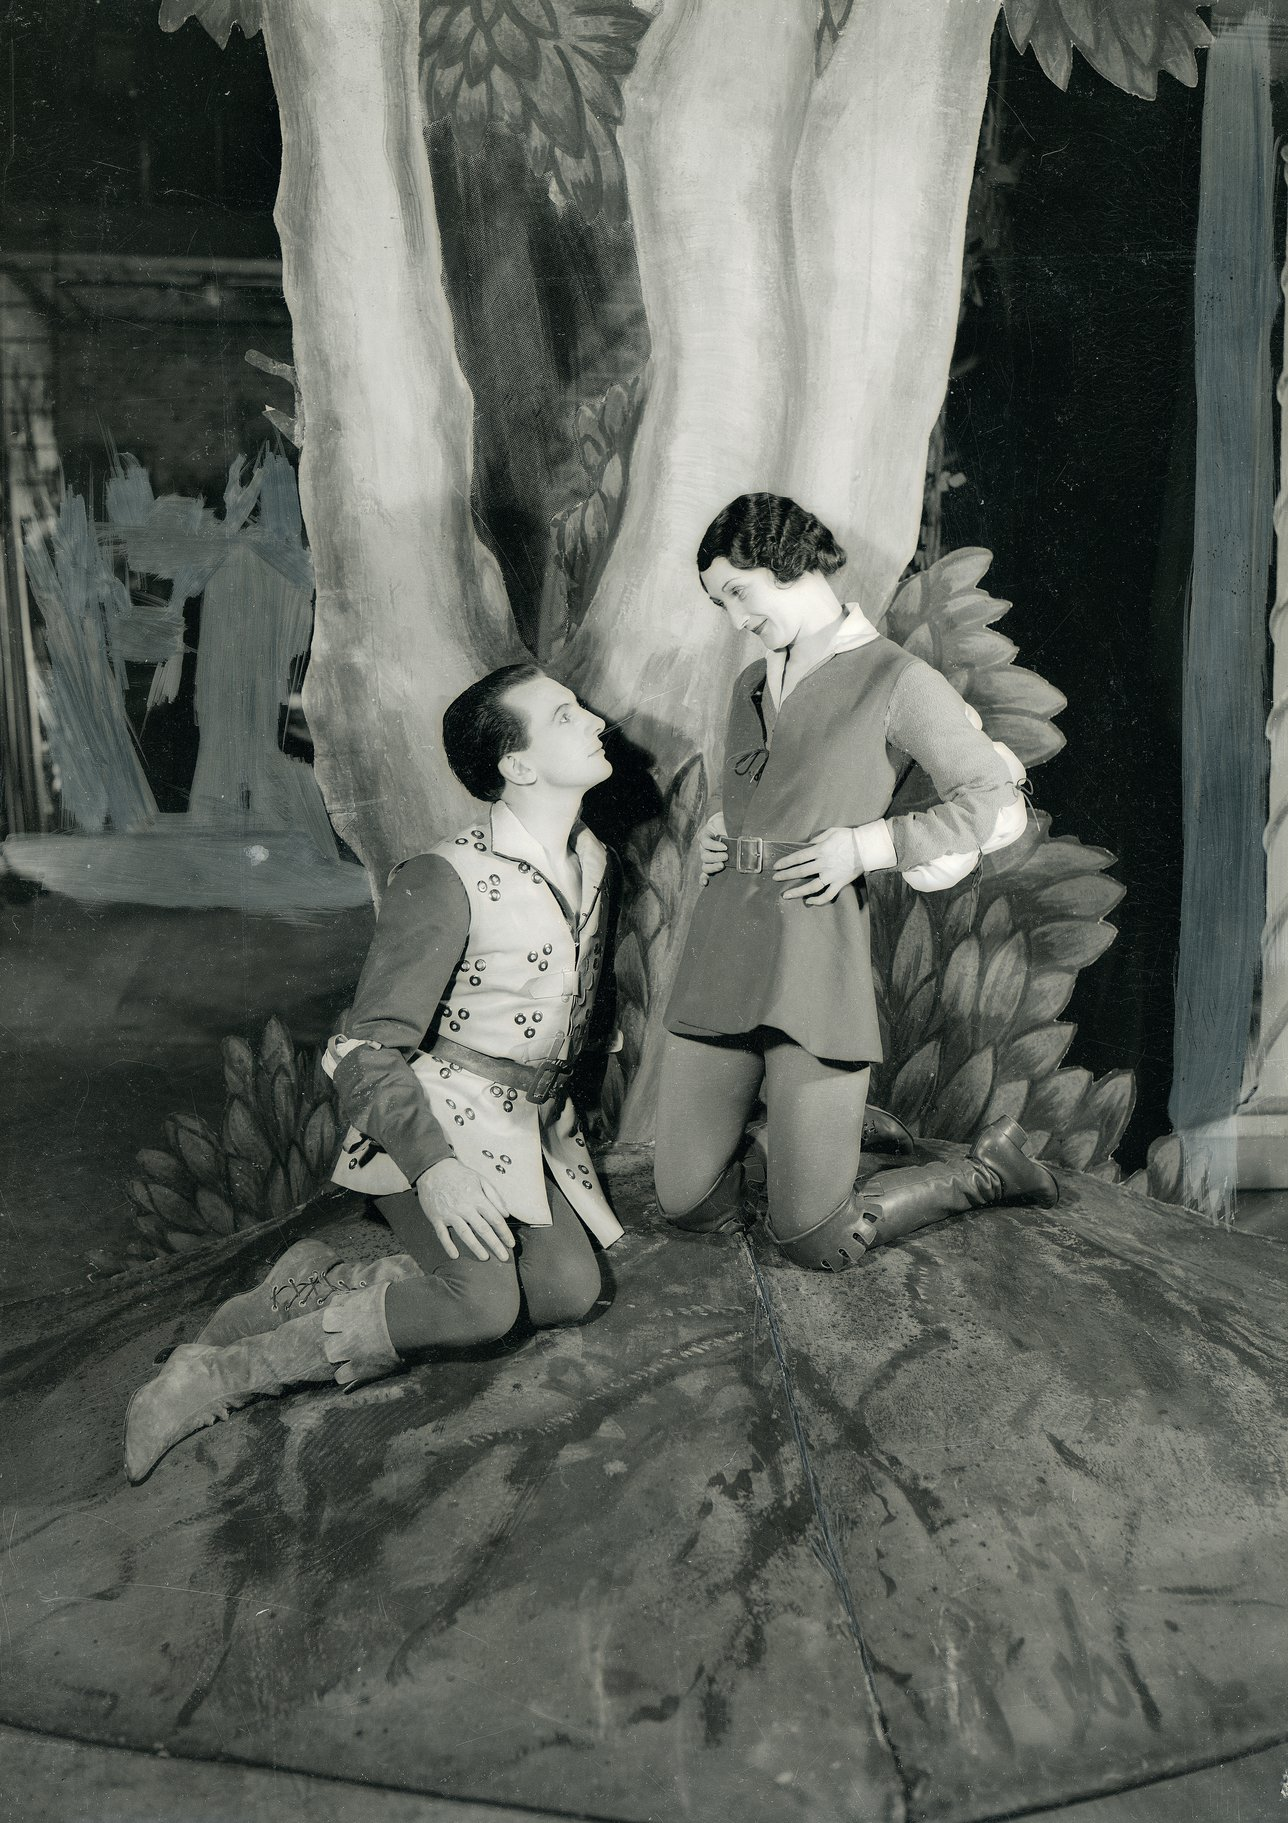 Orlando and Rosalind, dressed as Ganymede.